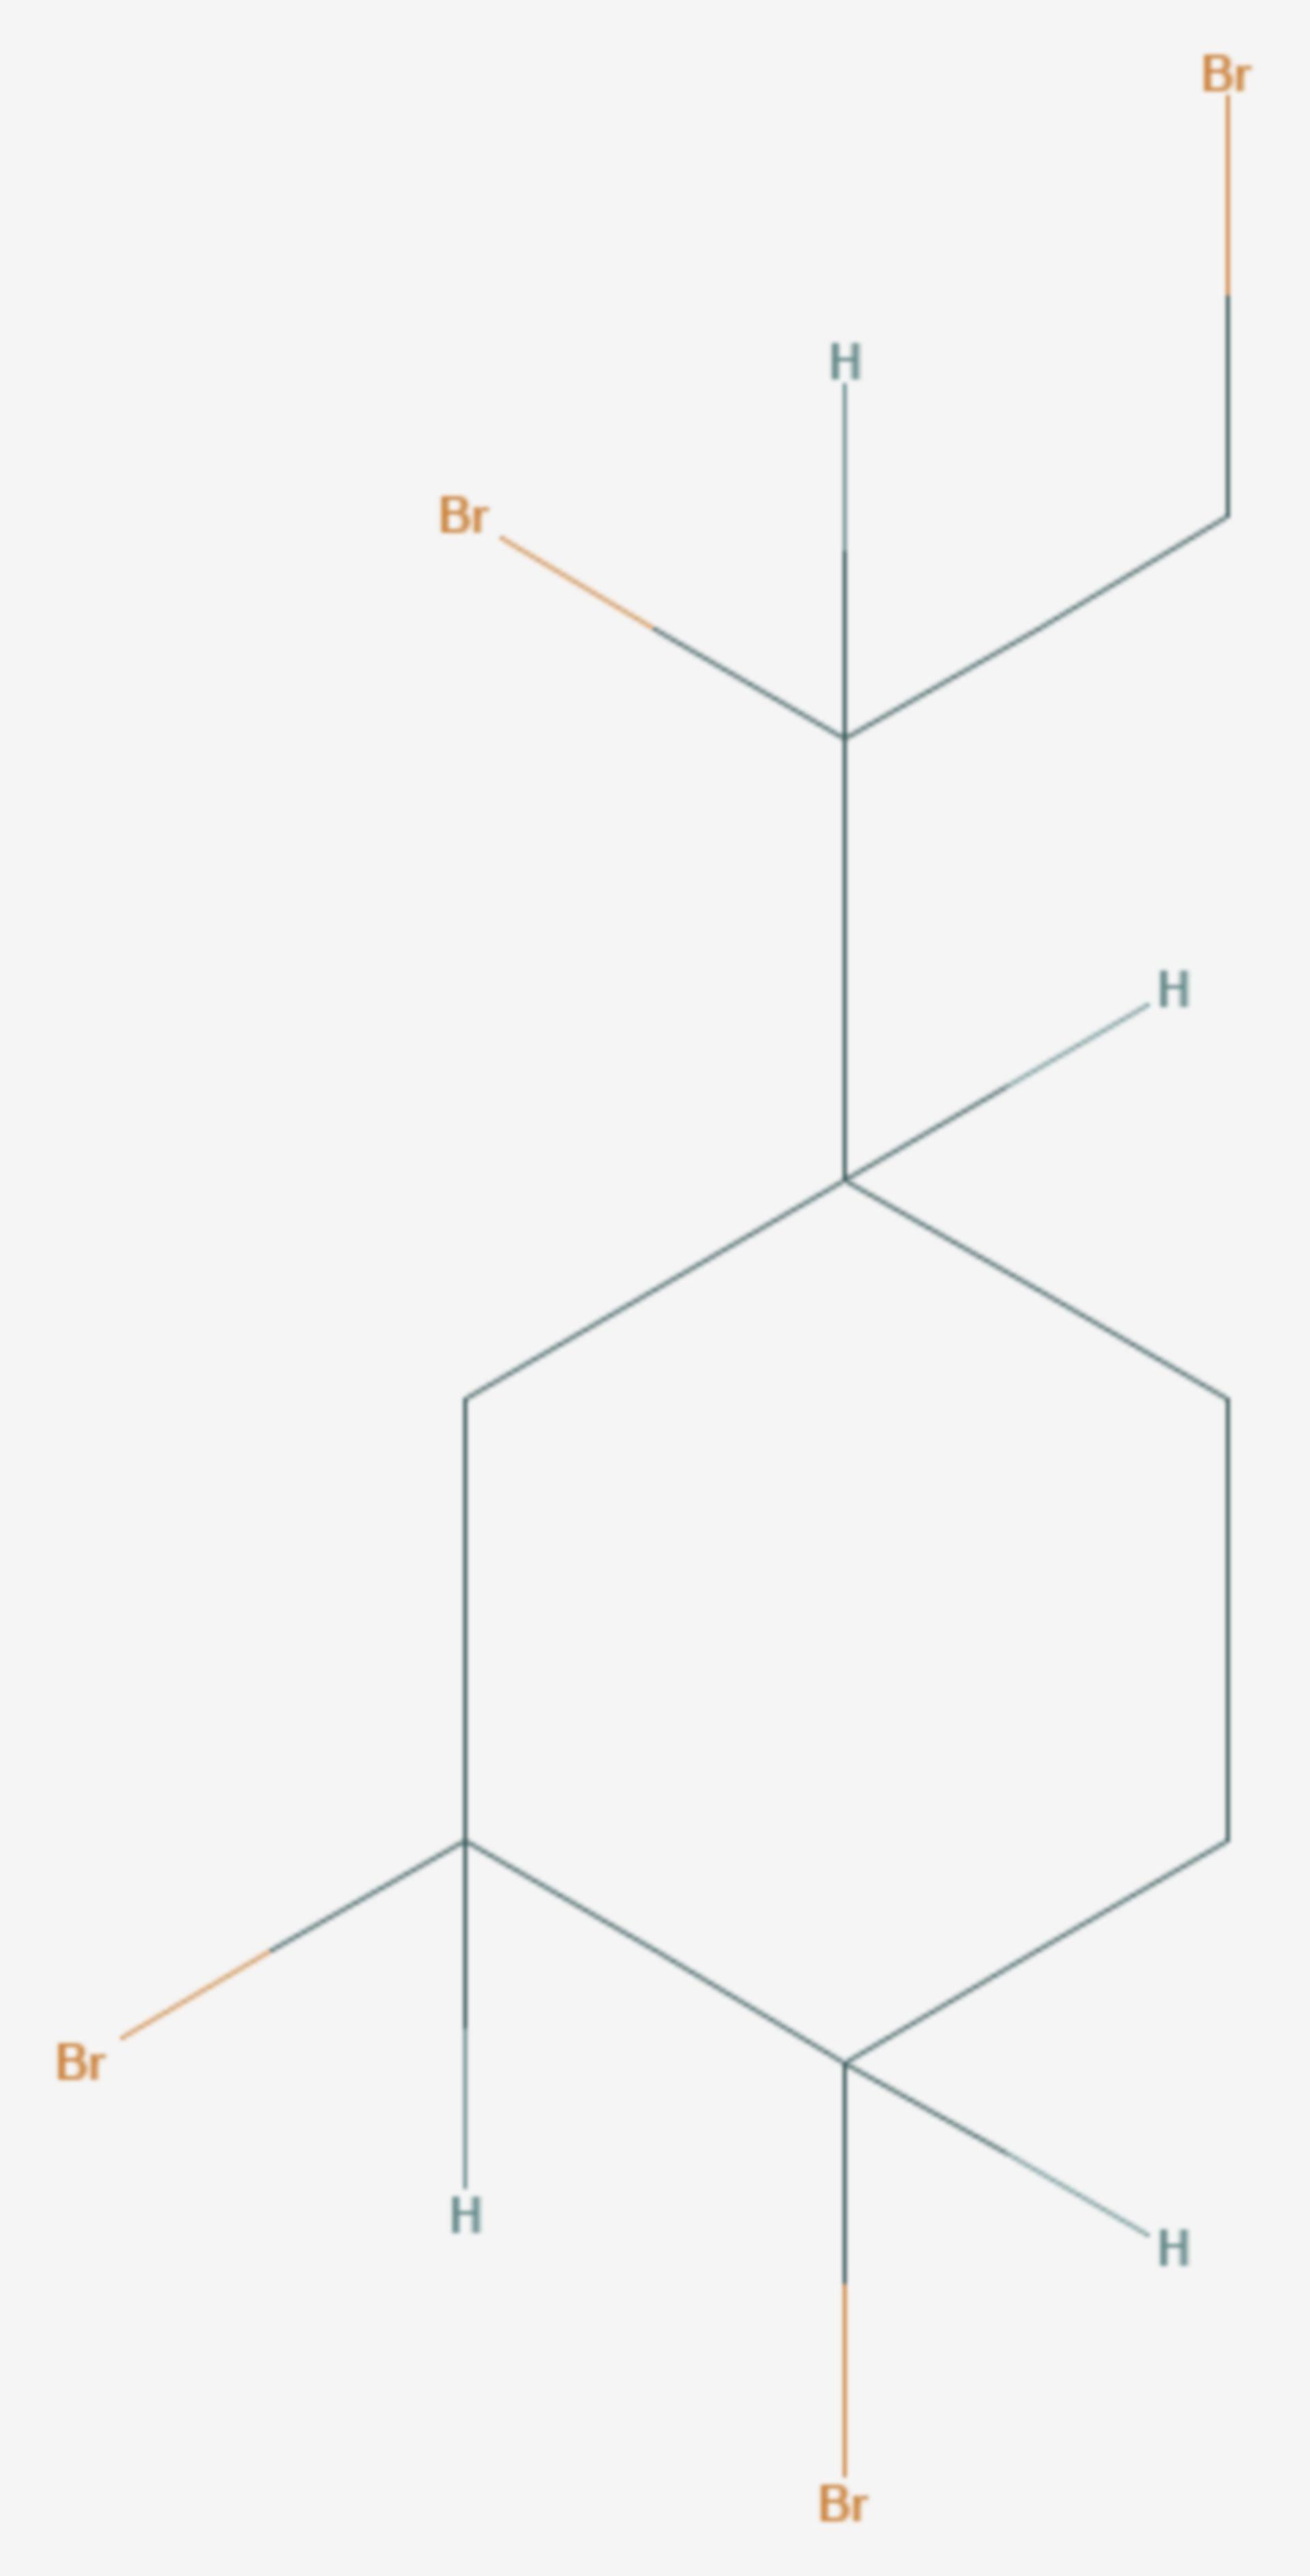 1,2-Dibrom-4-(1,2-dibromethyl)cyclohexan (Strukturformel)